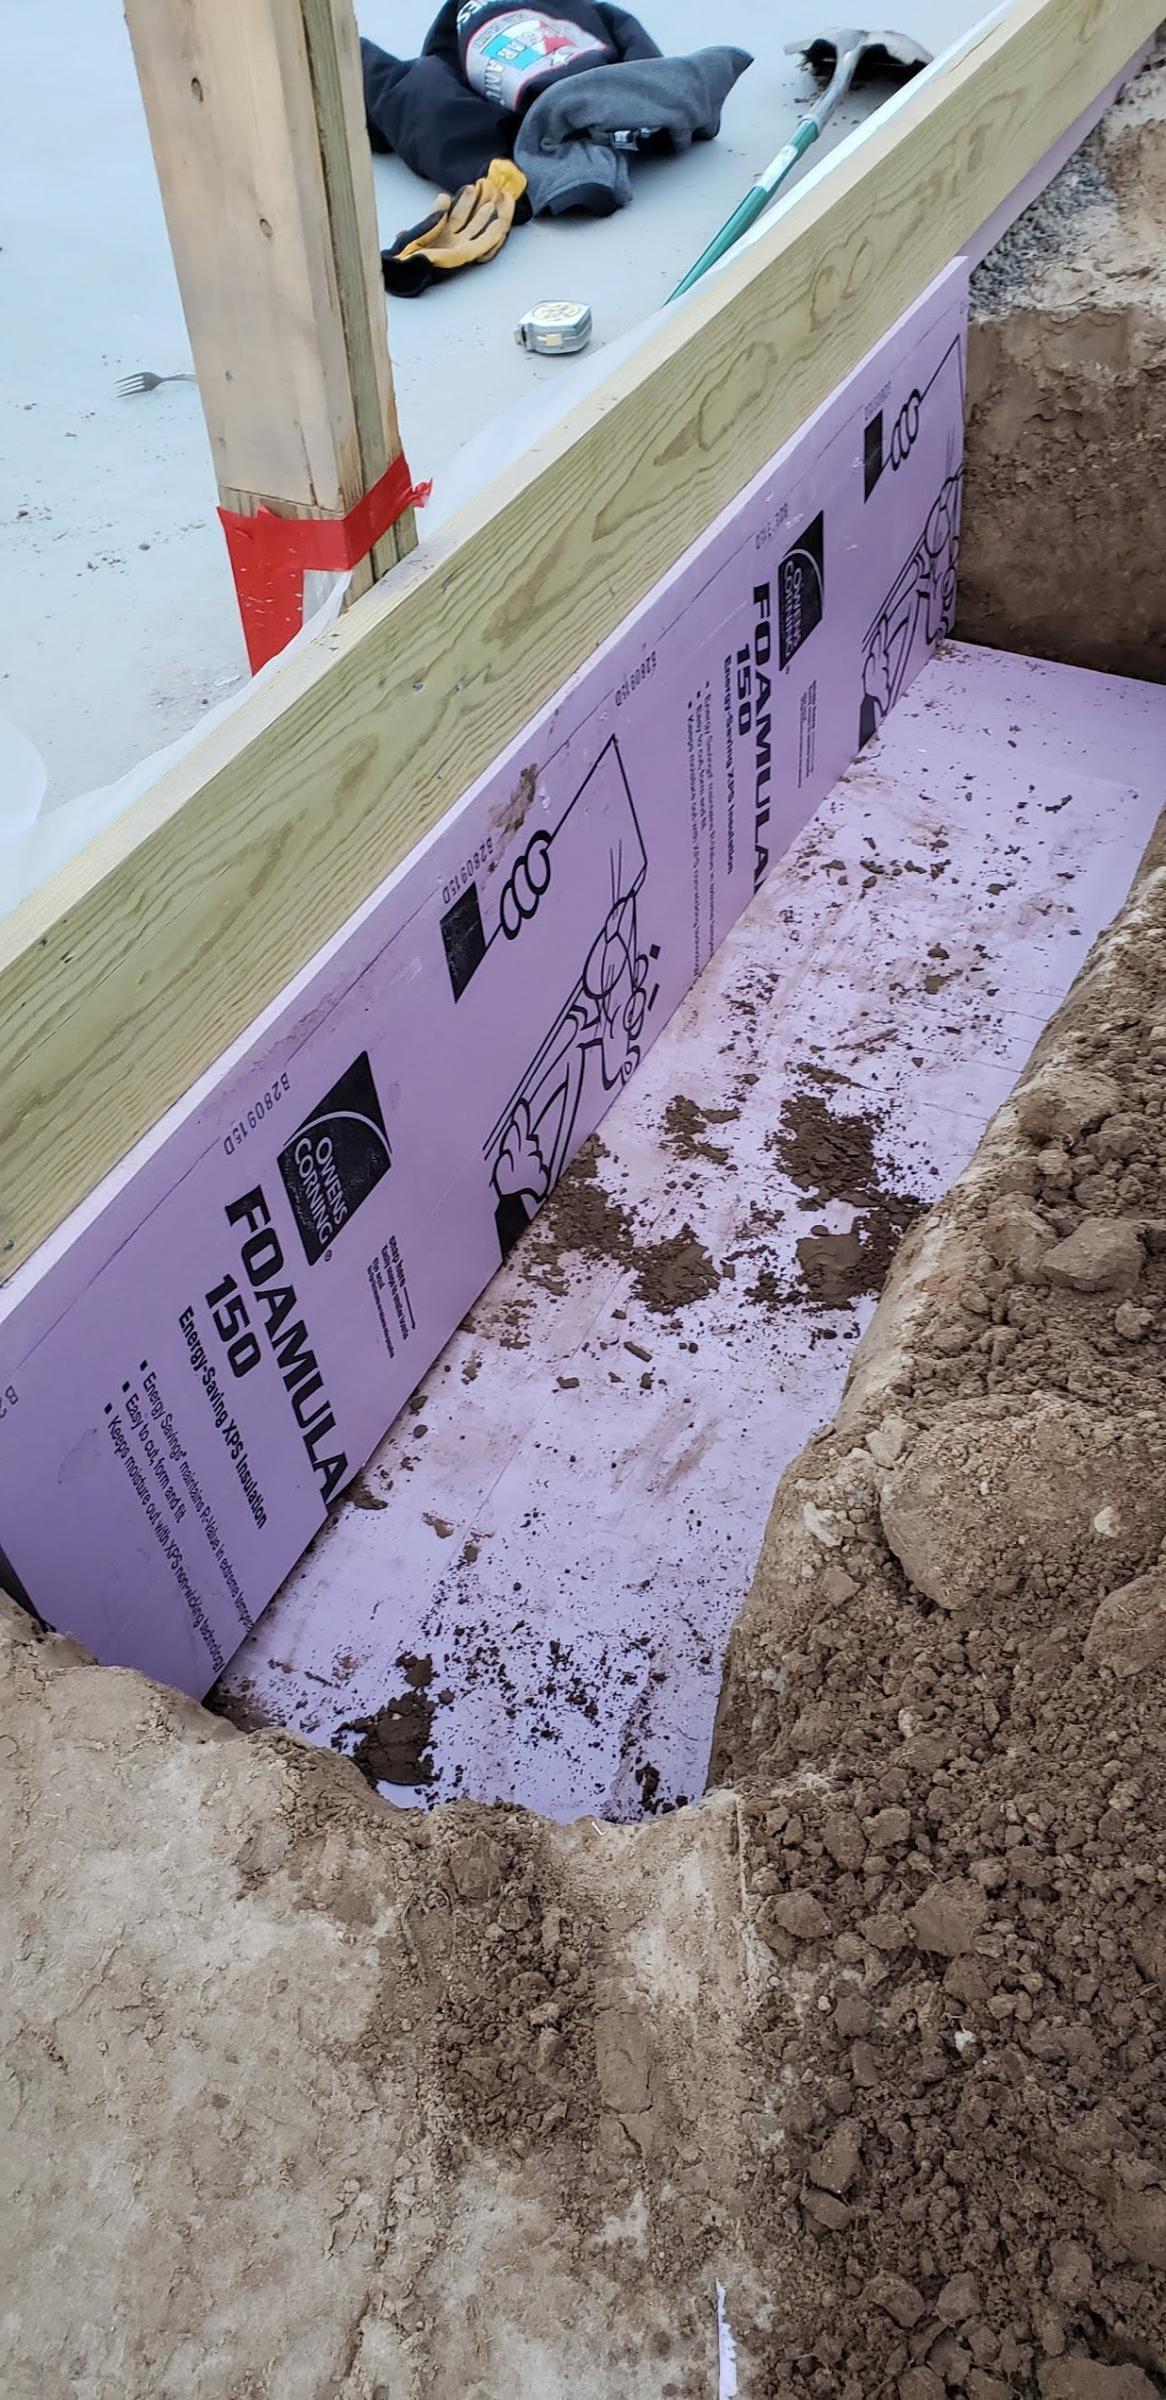 Our DIY home build. Margaskeeterville-download_20181102_193128_1541351763711.jpg